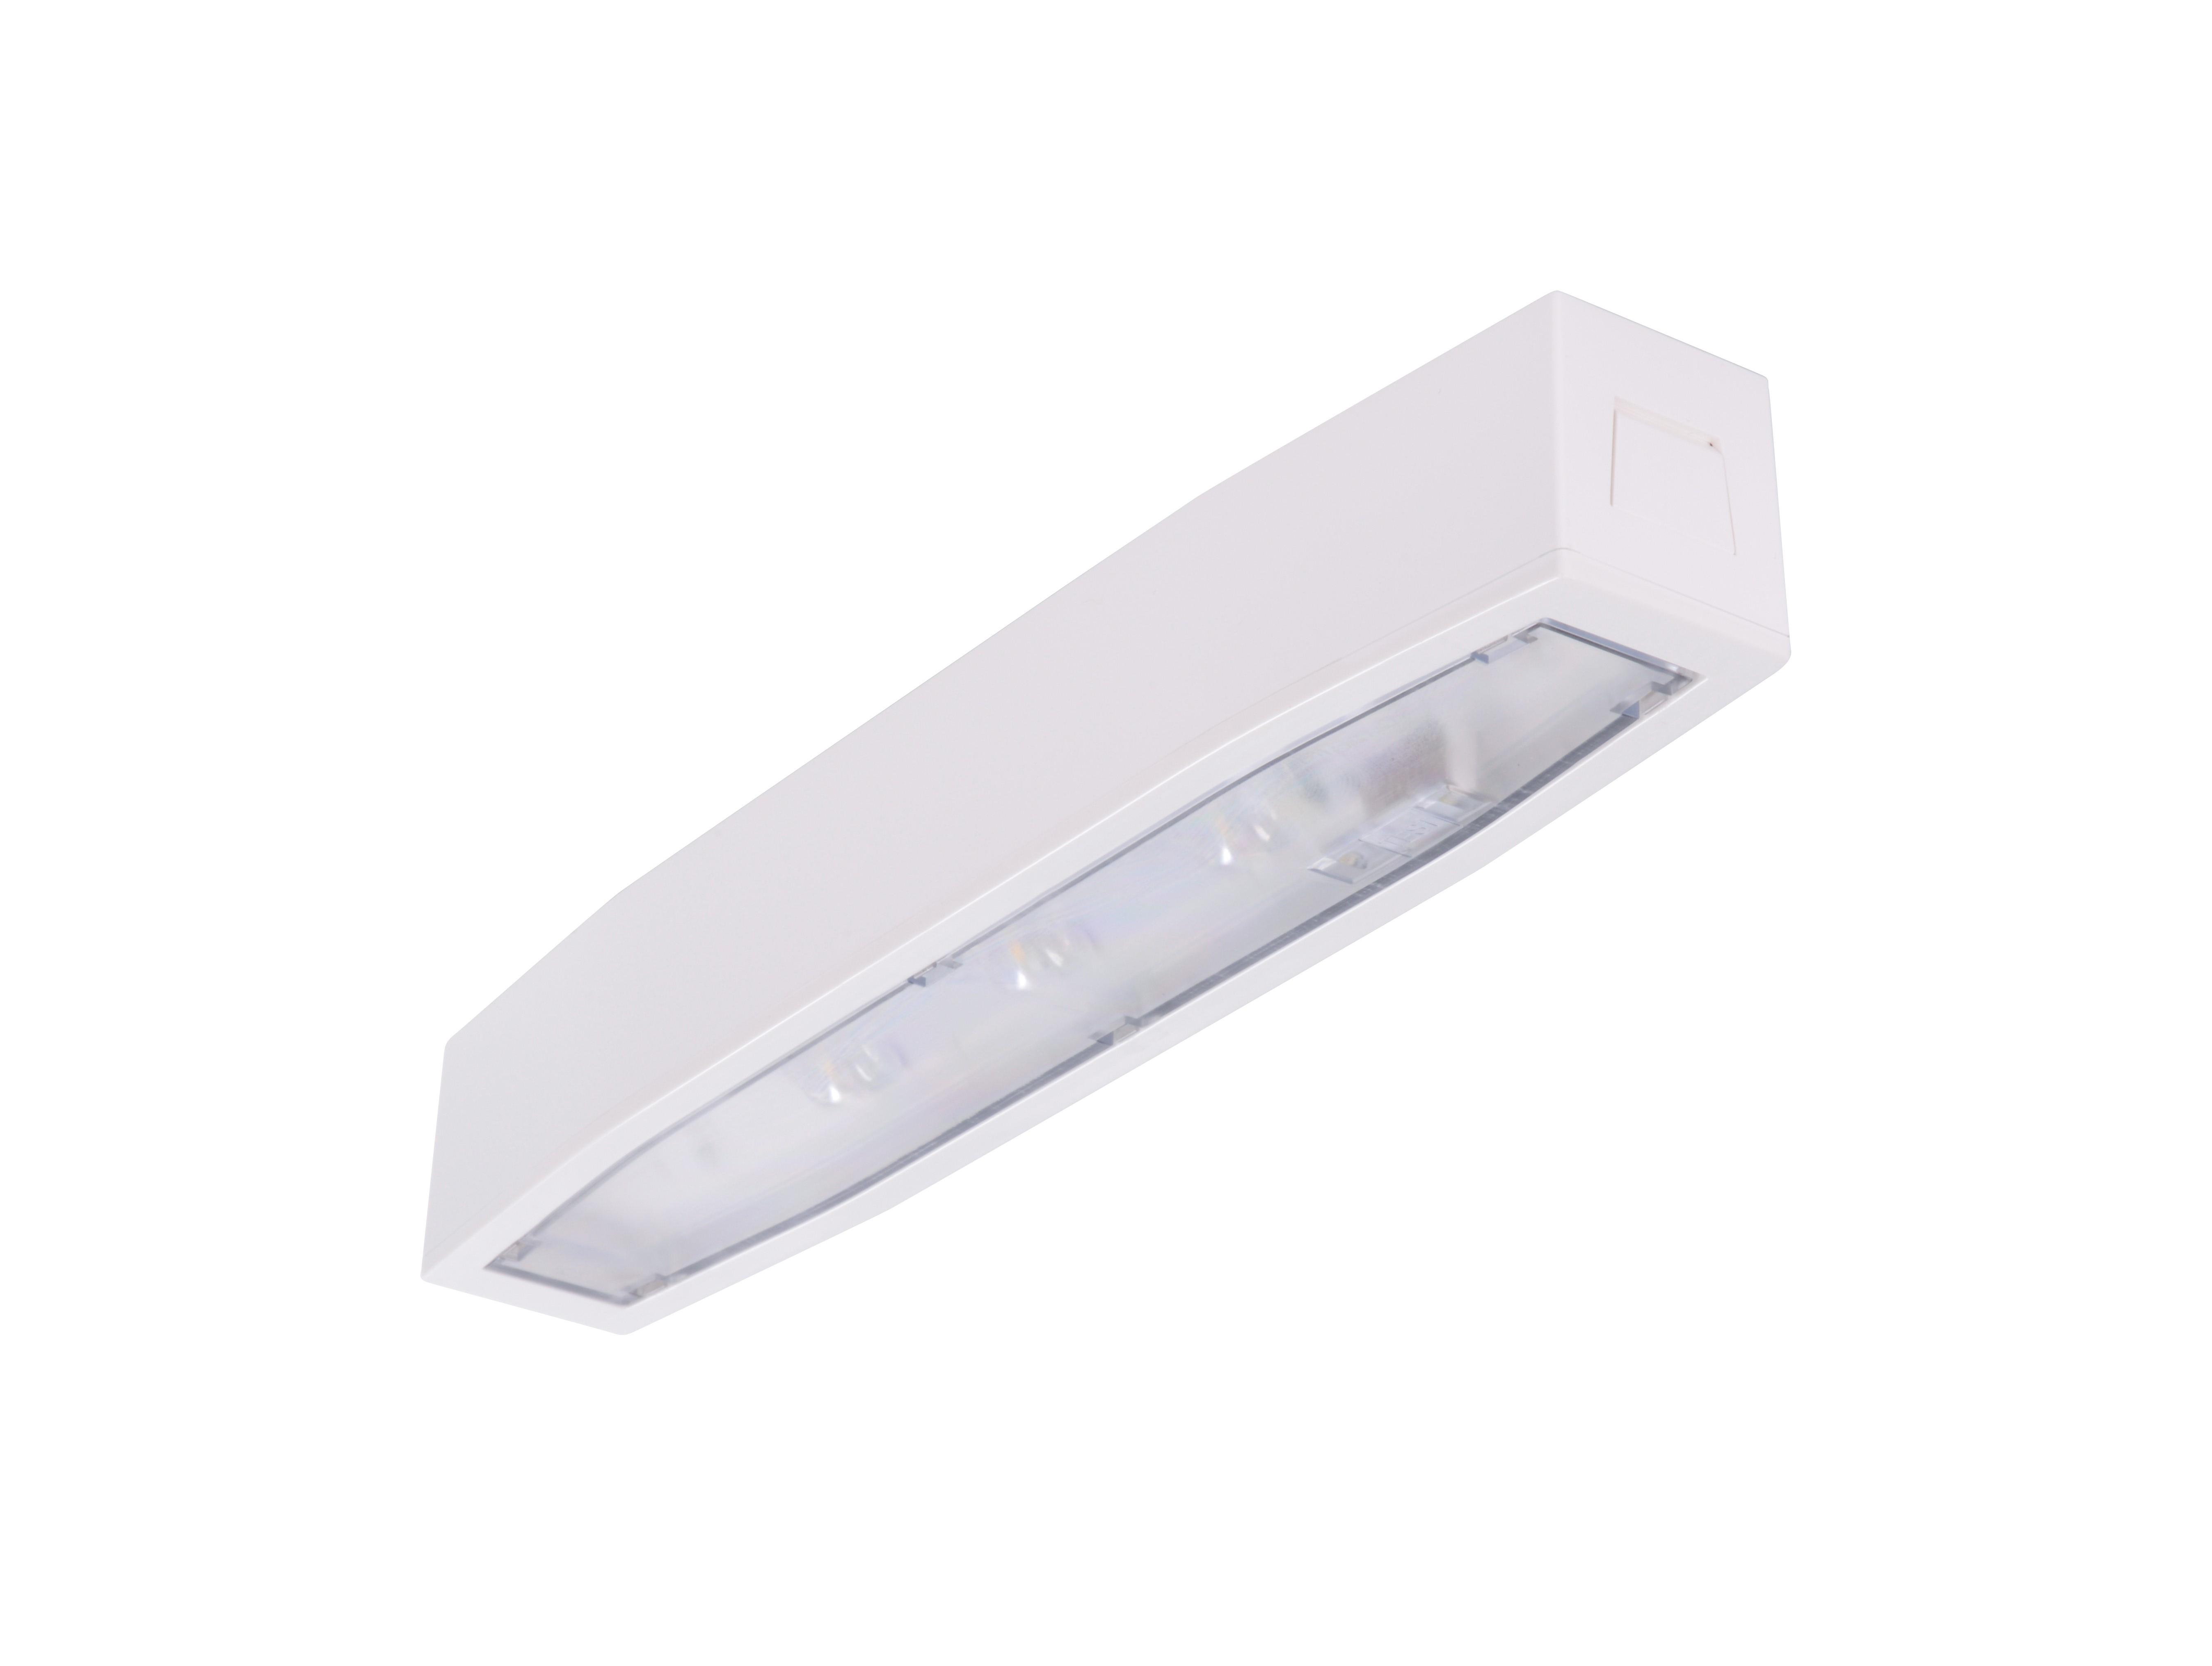 Lampa antipanica led Intelight 94569   2h nementinut test automat 0